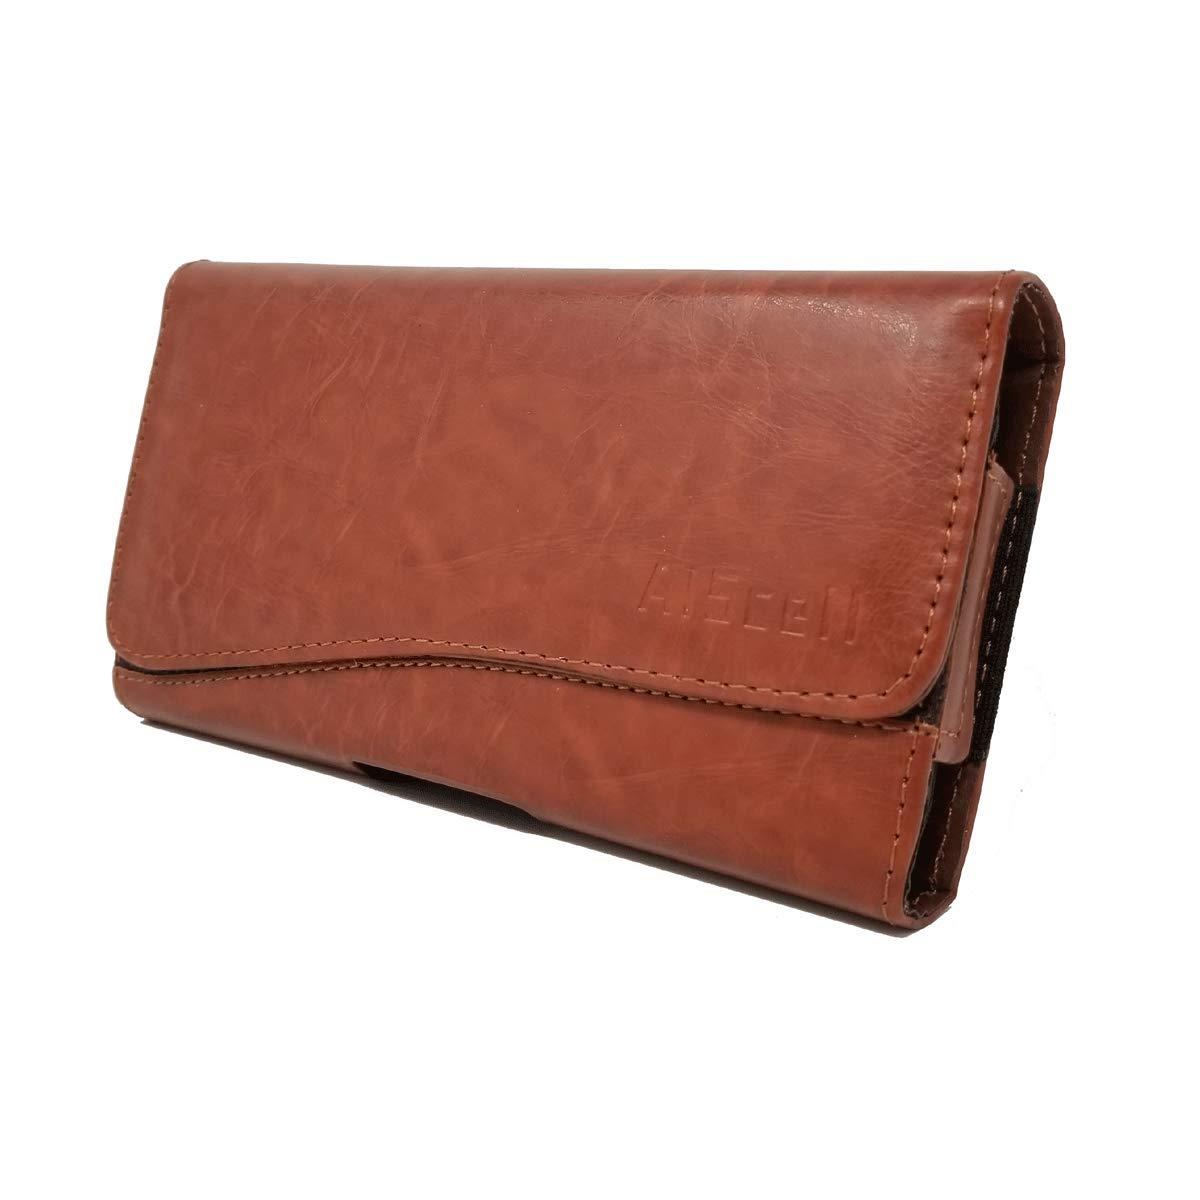 009bfaa32068 Amazon.com: AIScell Wallet Belt Pouch for Moto G7 Power, e5 Plus, e5 ...